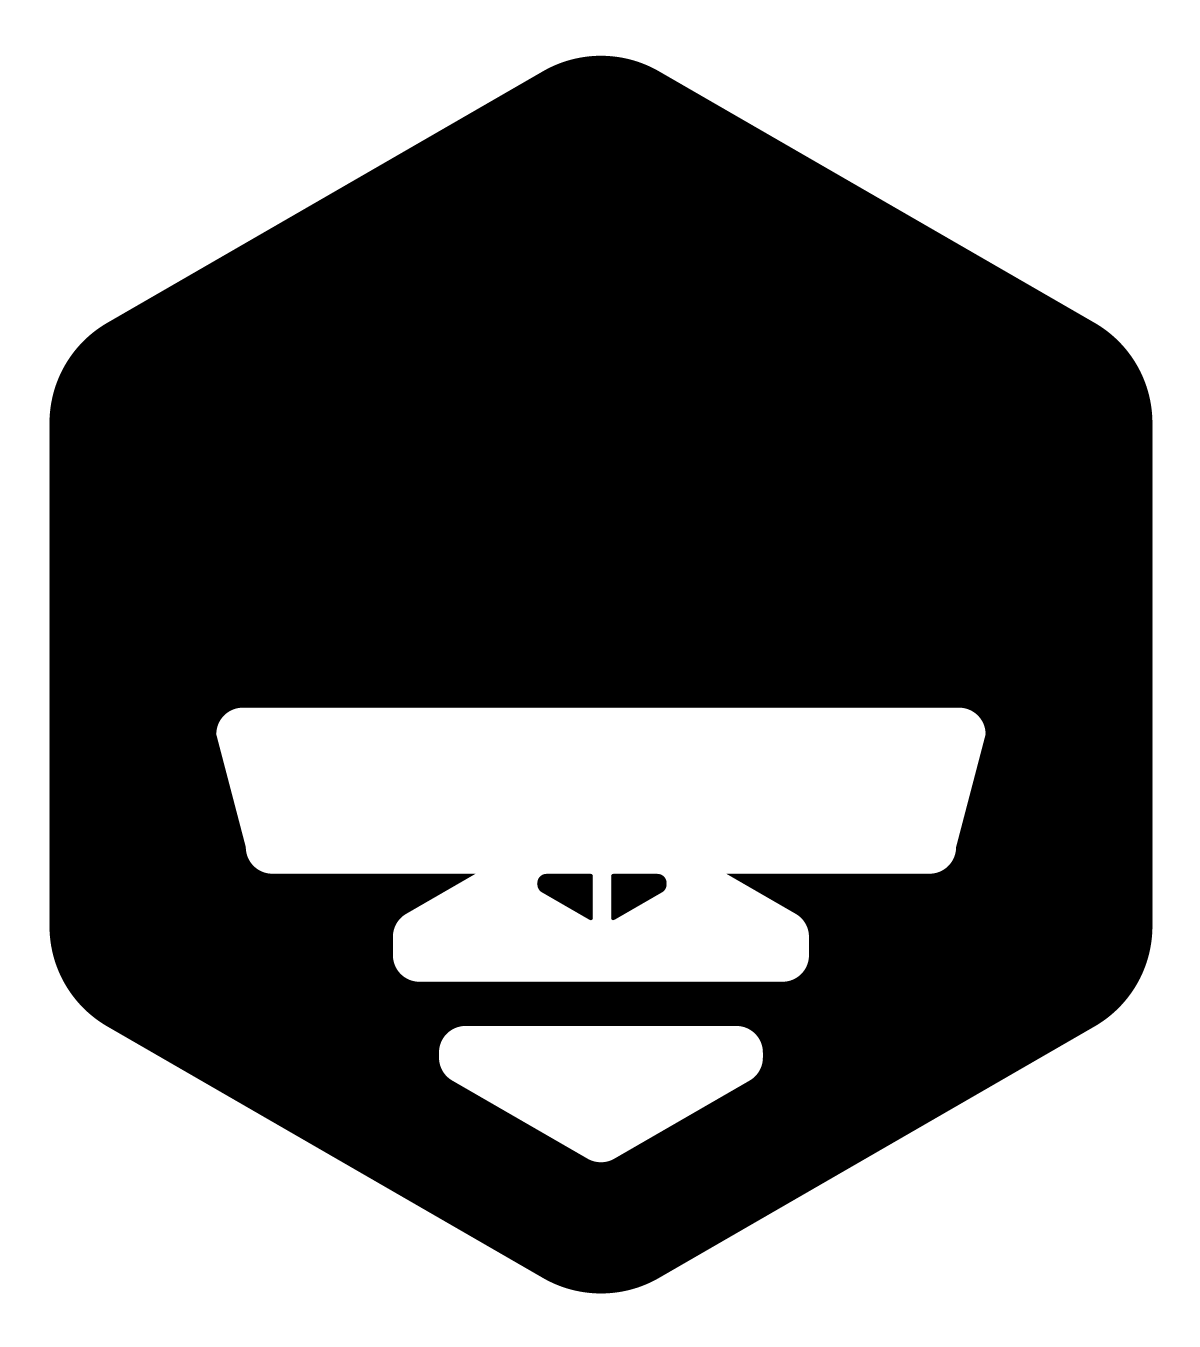 Awkward Ape LLC - Design Consulting